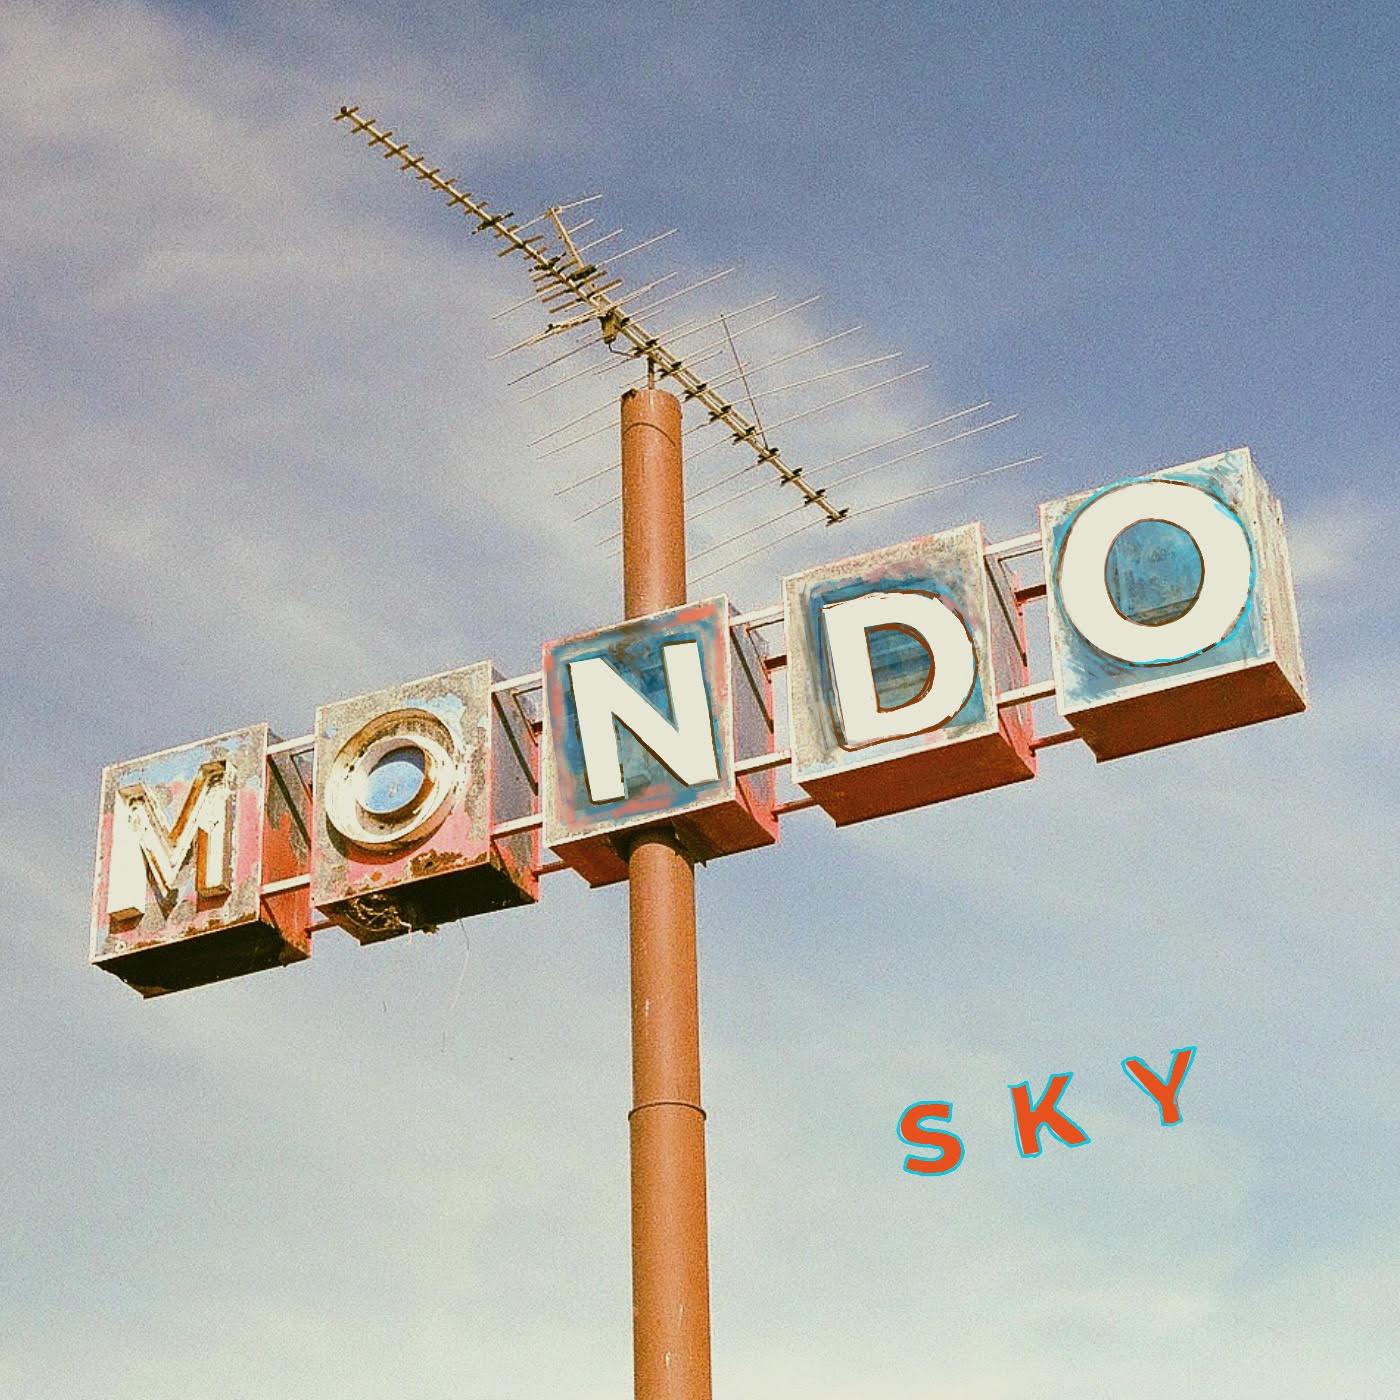 MondoSky.jpg